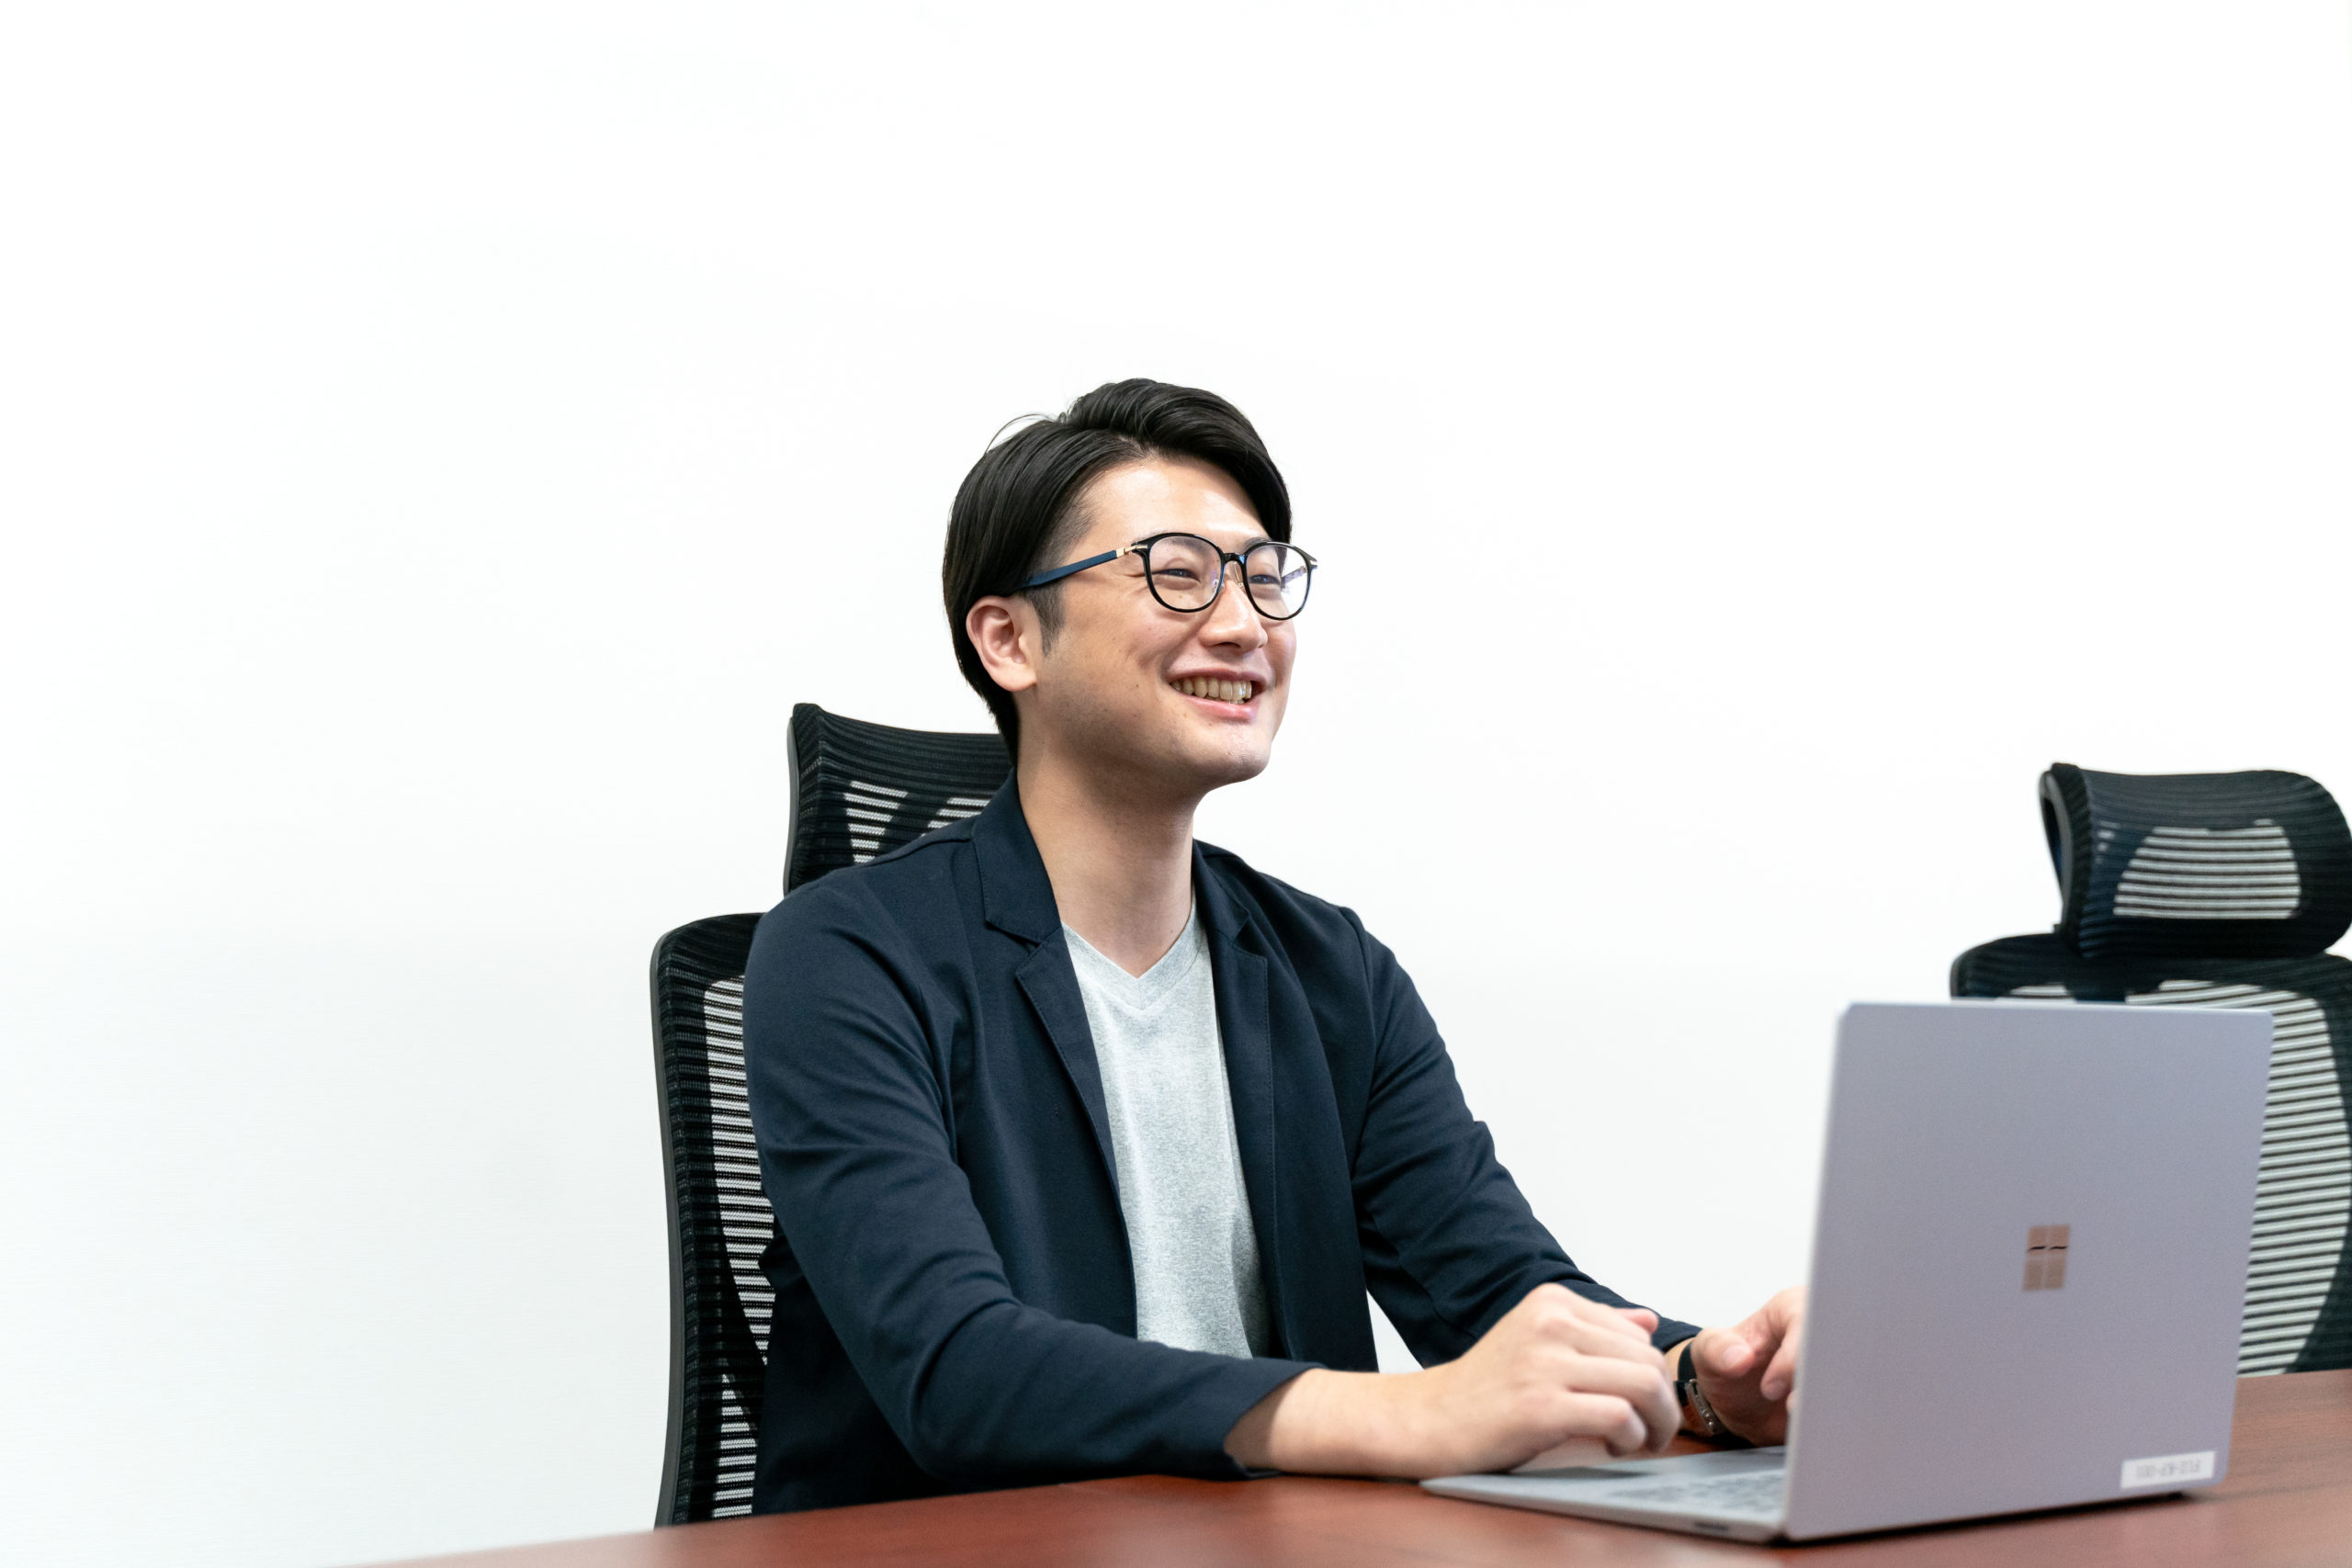 株式会社Fusion'z 取締役 ローソン事業本部長